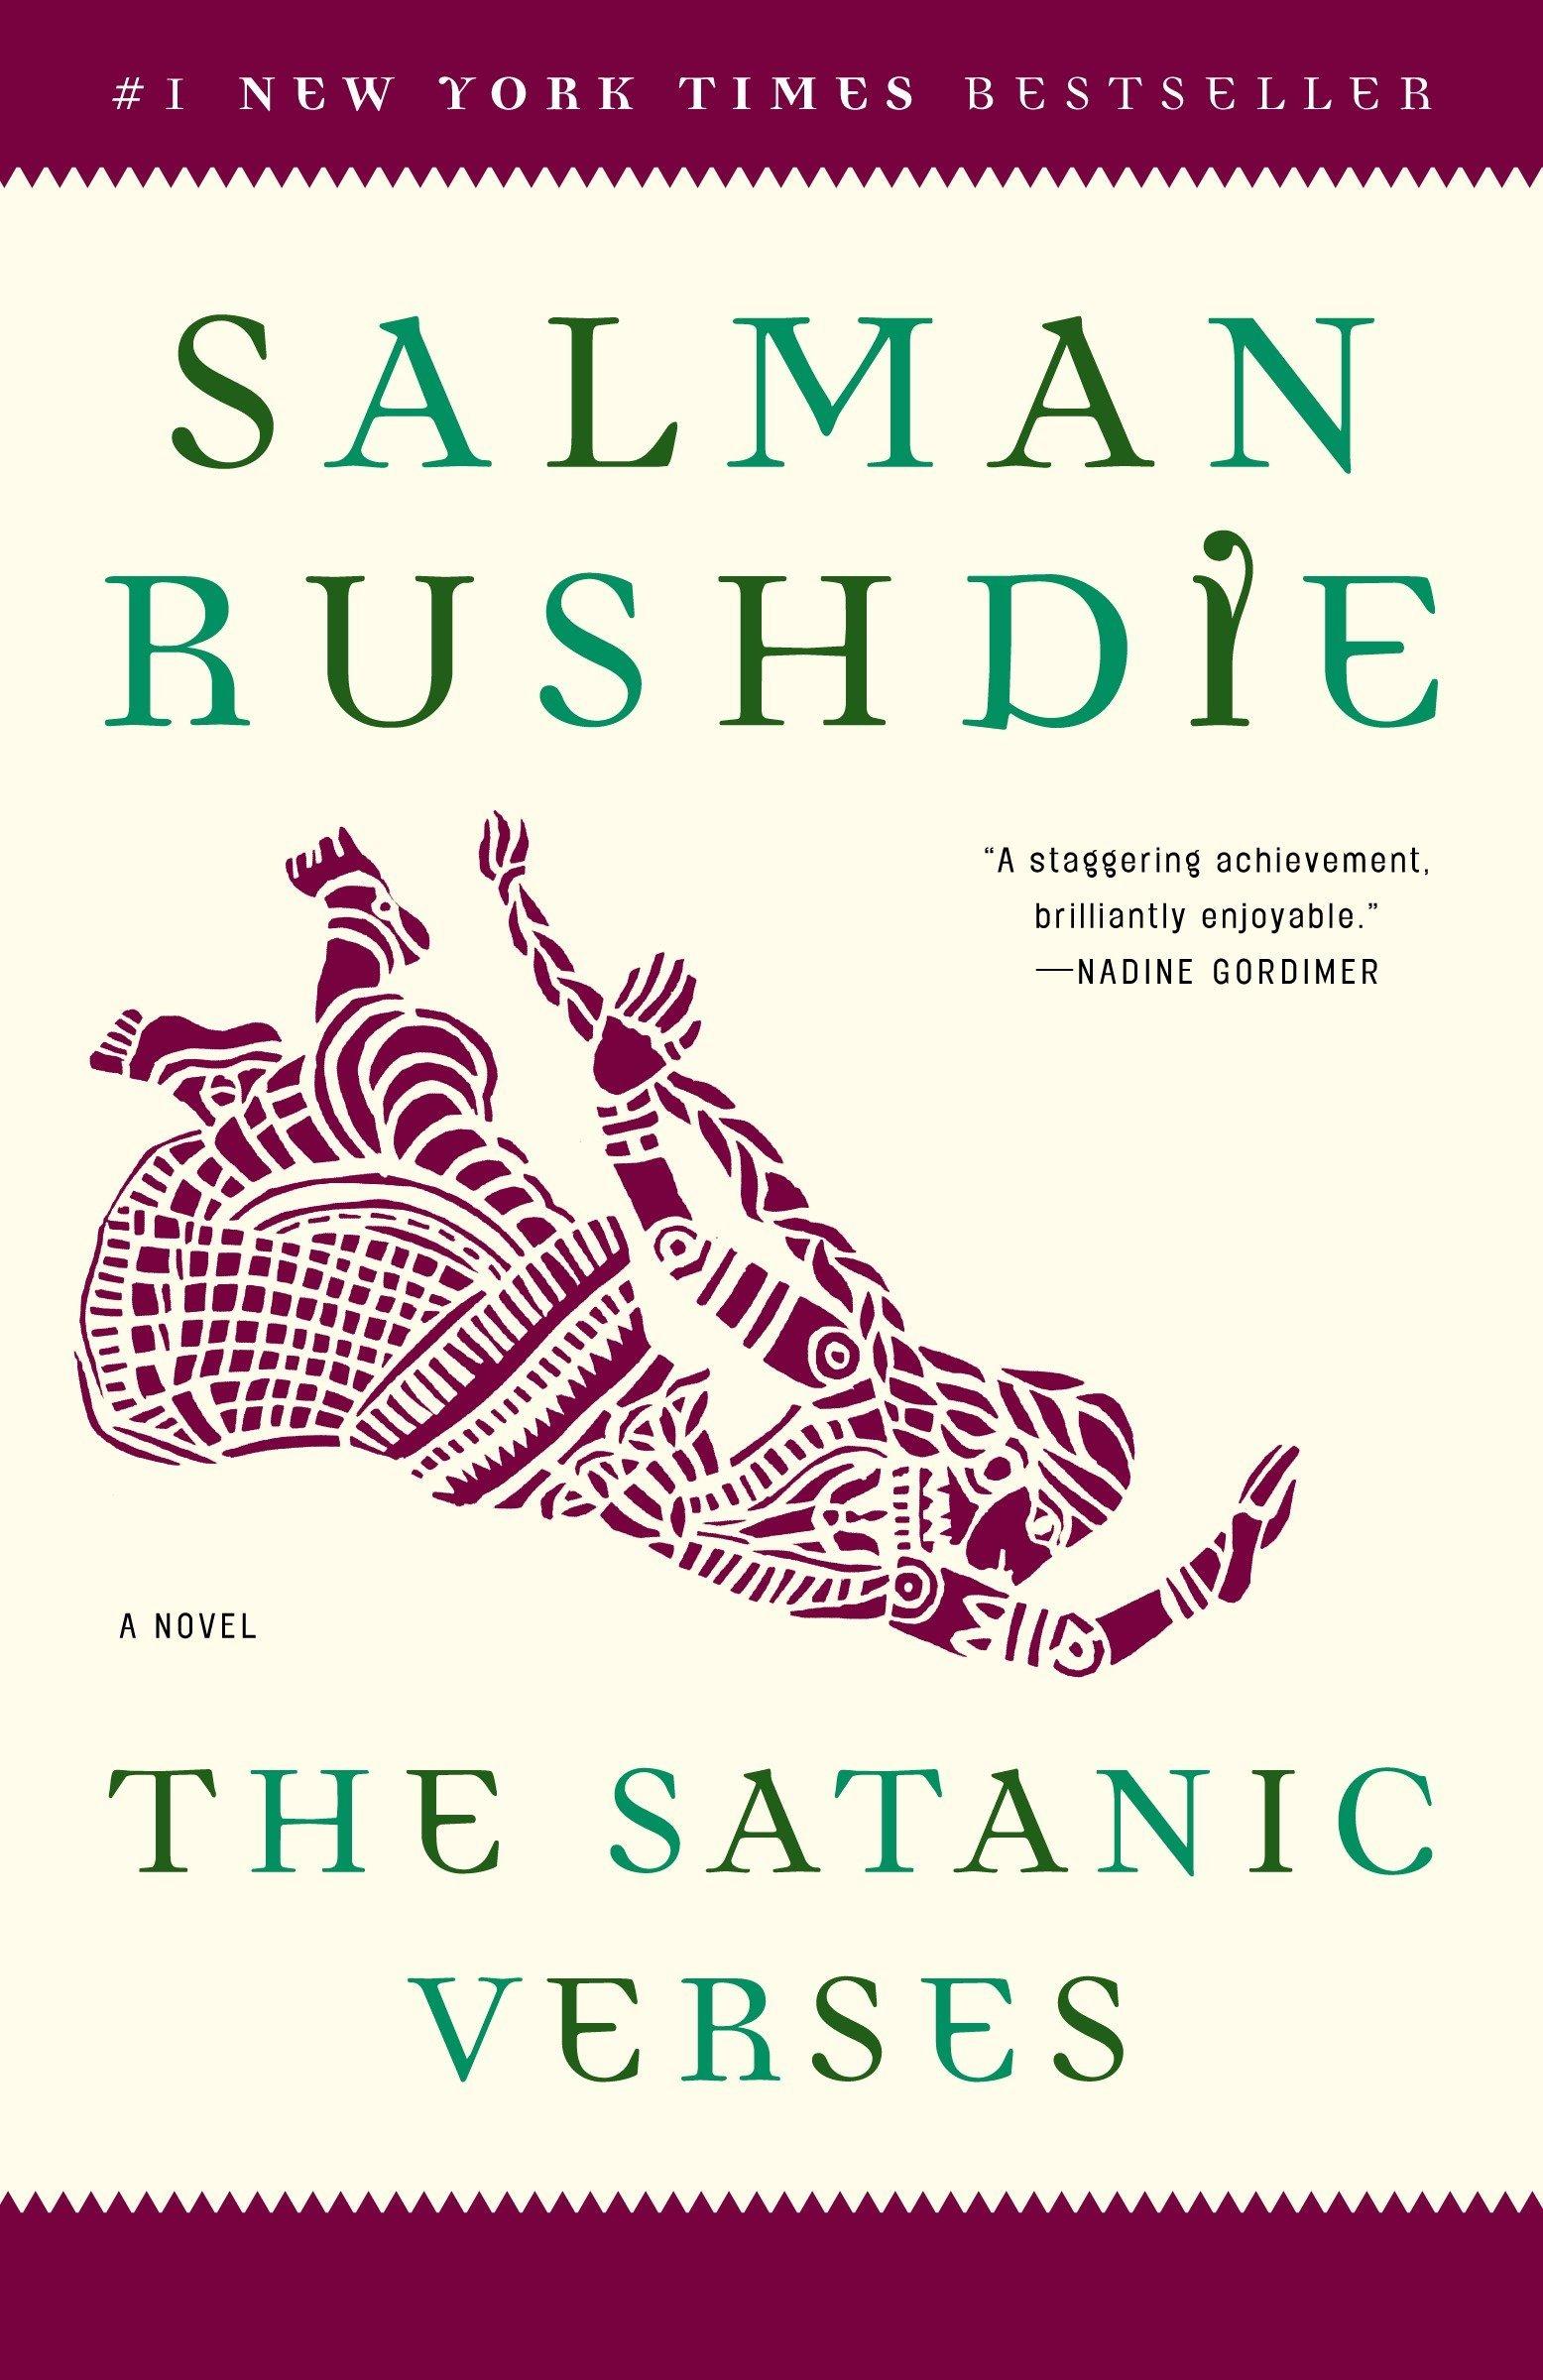 The Satanic Verses: A Novel: Salman Rushdie: 9780812976717: Amazon